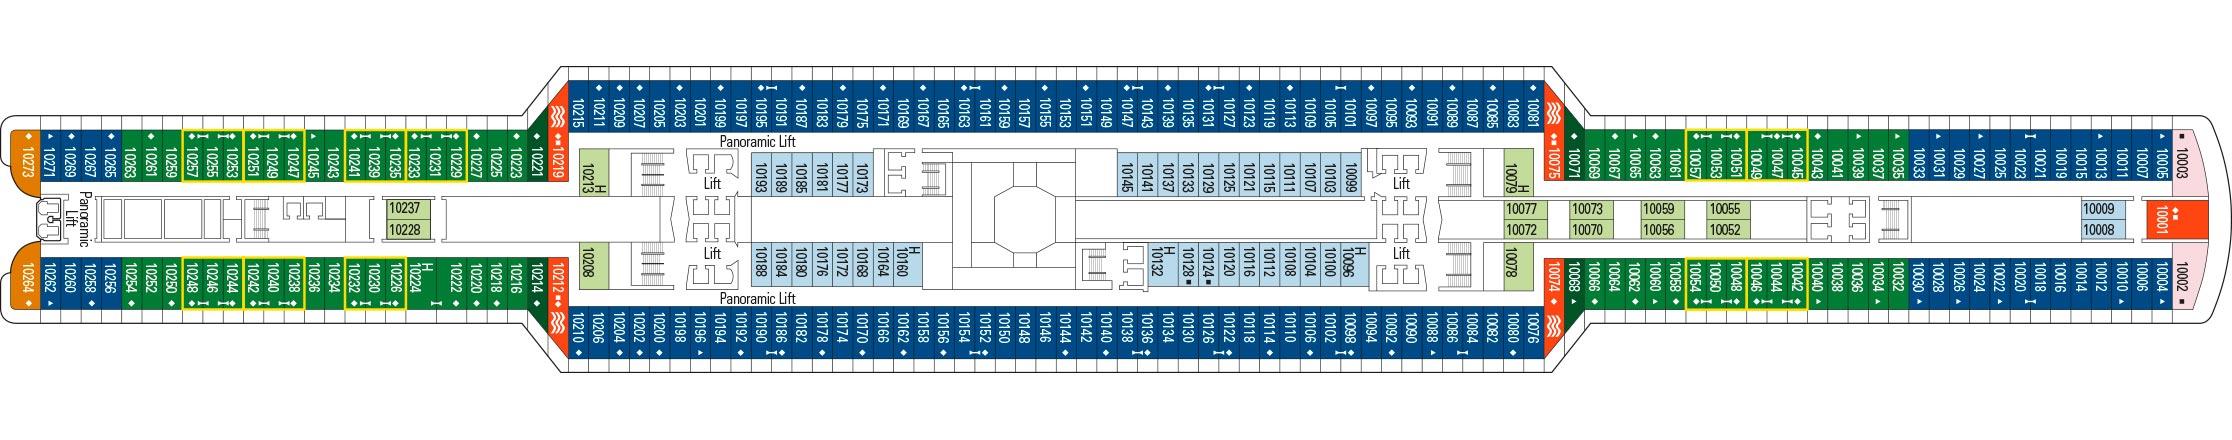 MSC Cruises MSC Seaview Deckplans Deck 10.jpg